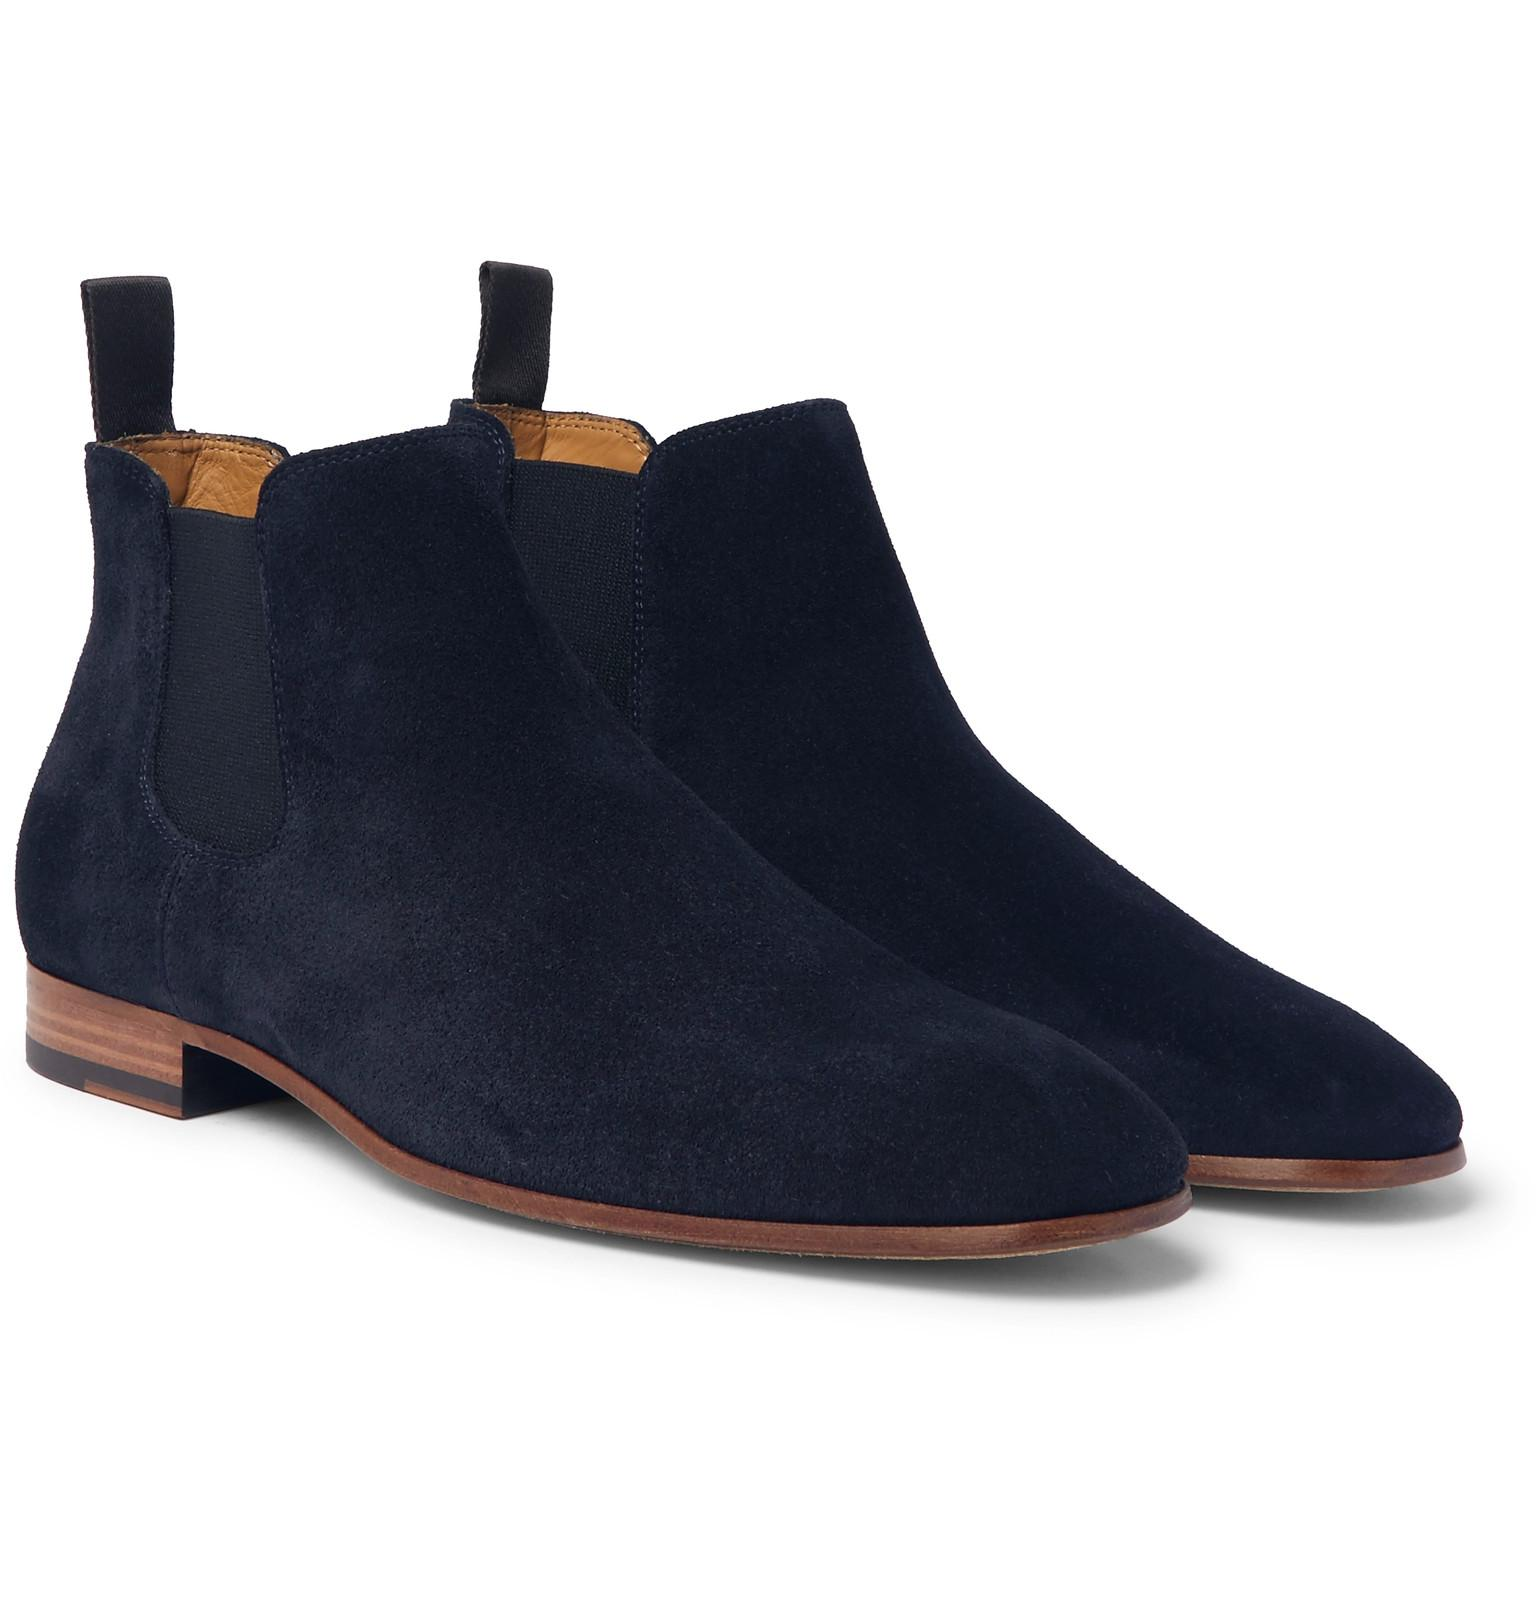 c4d2f264f Clothing, Shoes & Accessories Hugo Boss Shoes Dressapp_Cheb_Bu Ankle Boots  Men Brown Brand New Men's Shoes